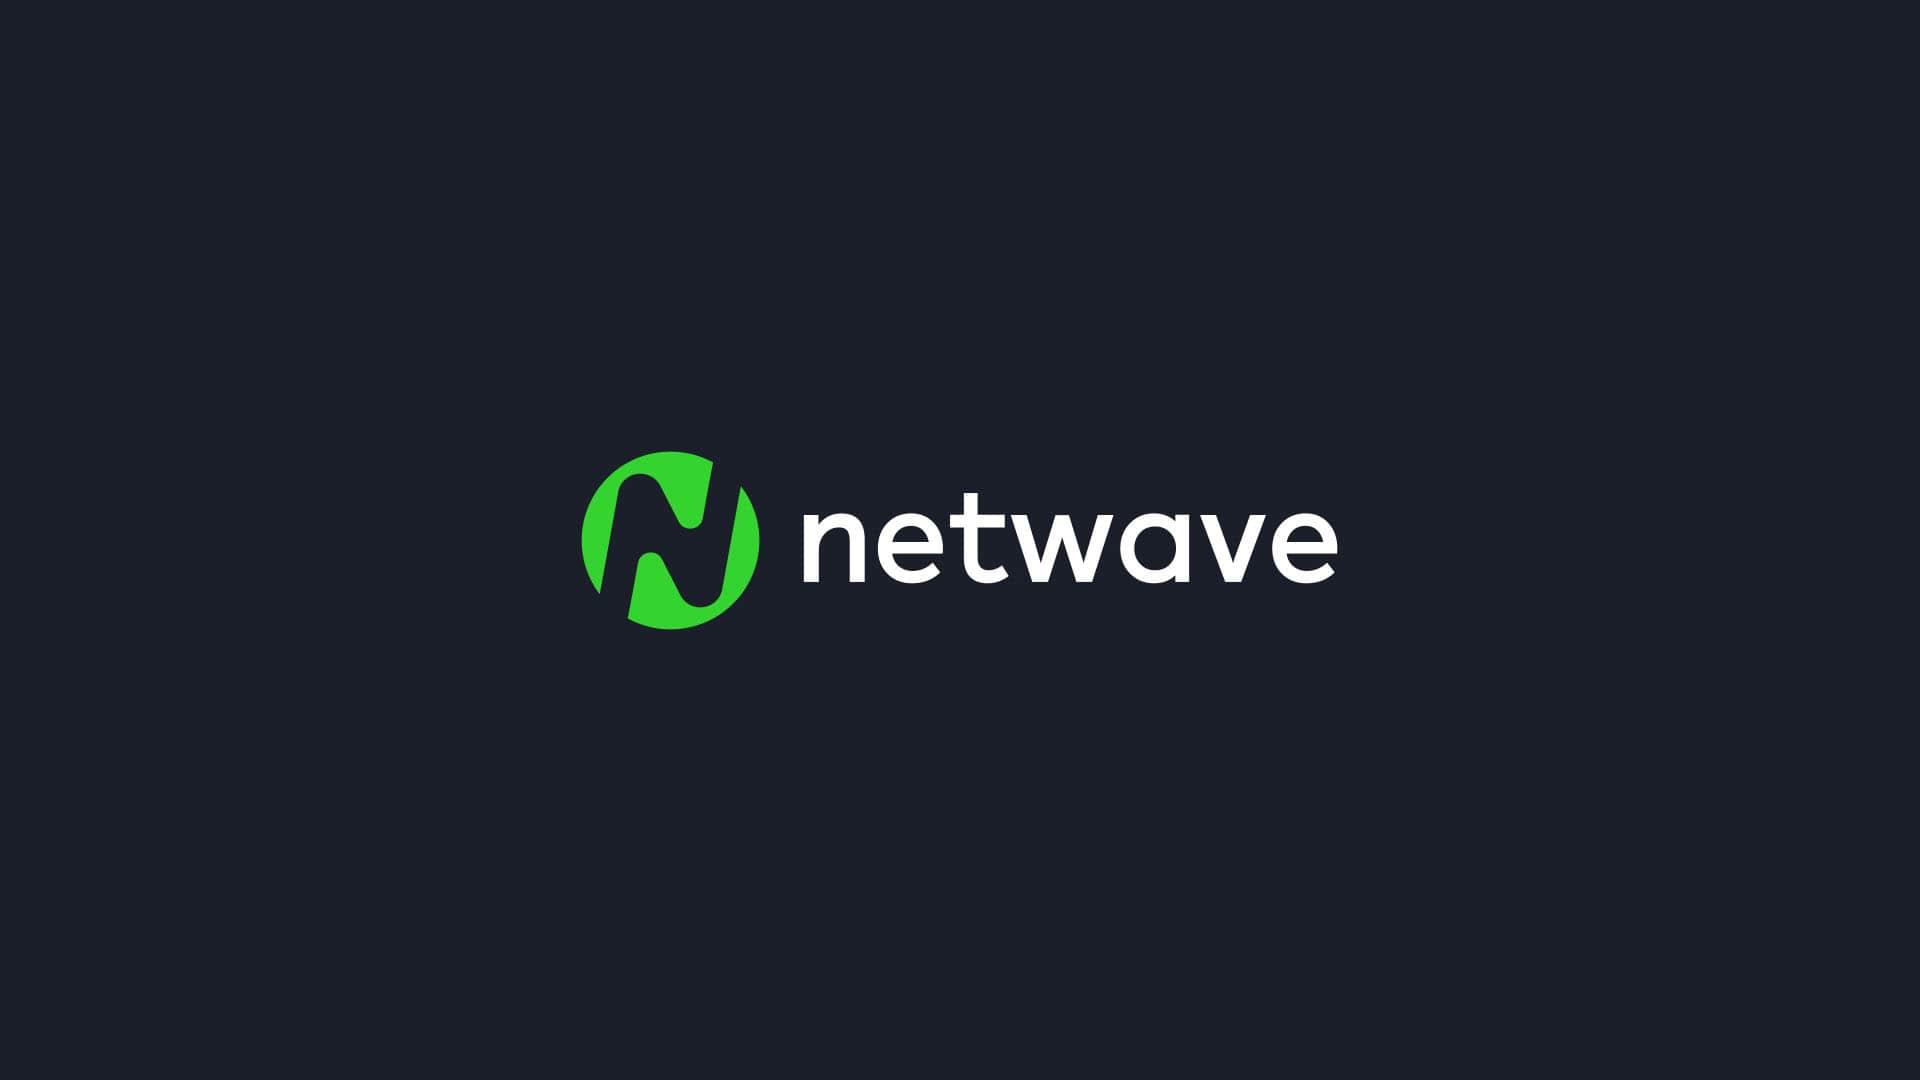 gra brand design netwave main